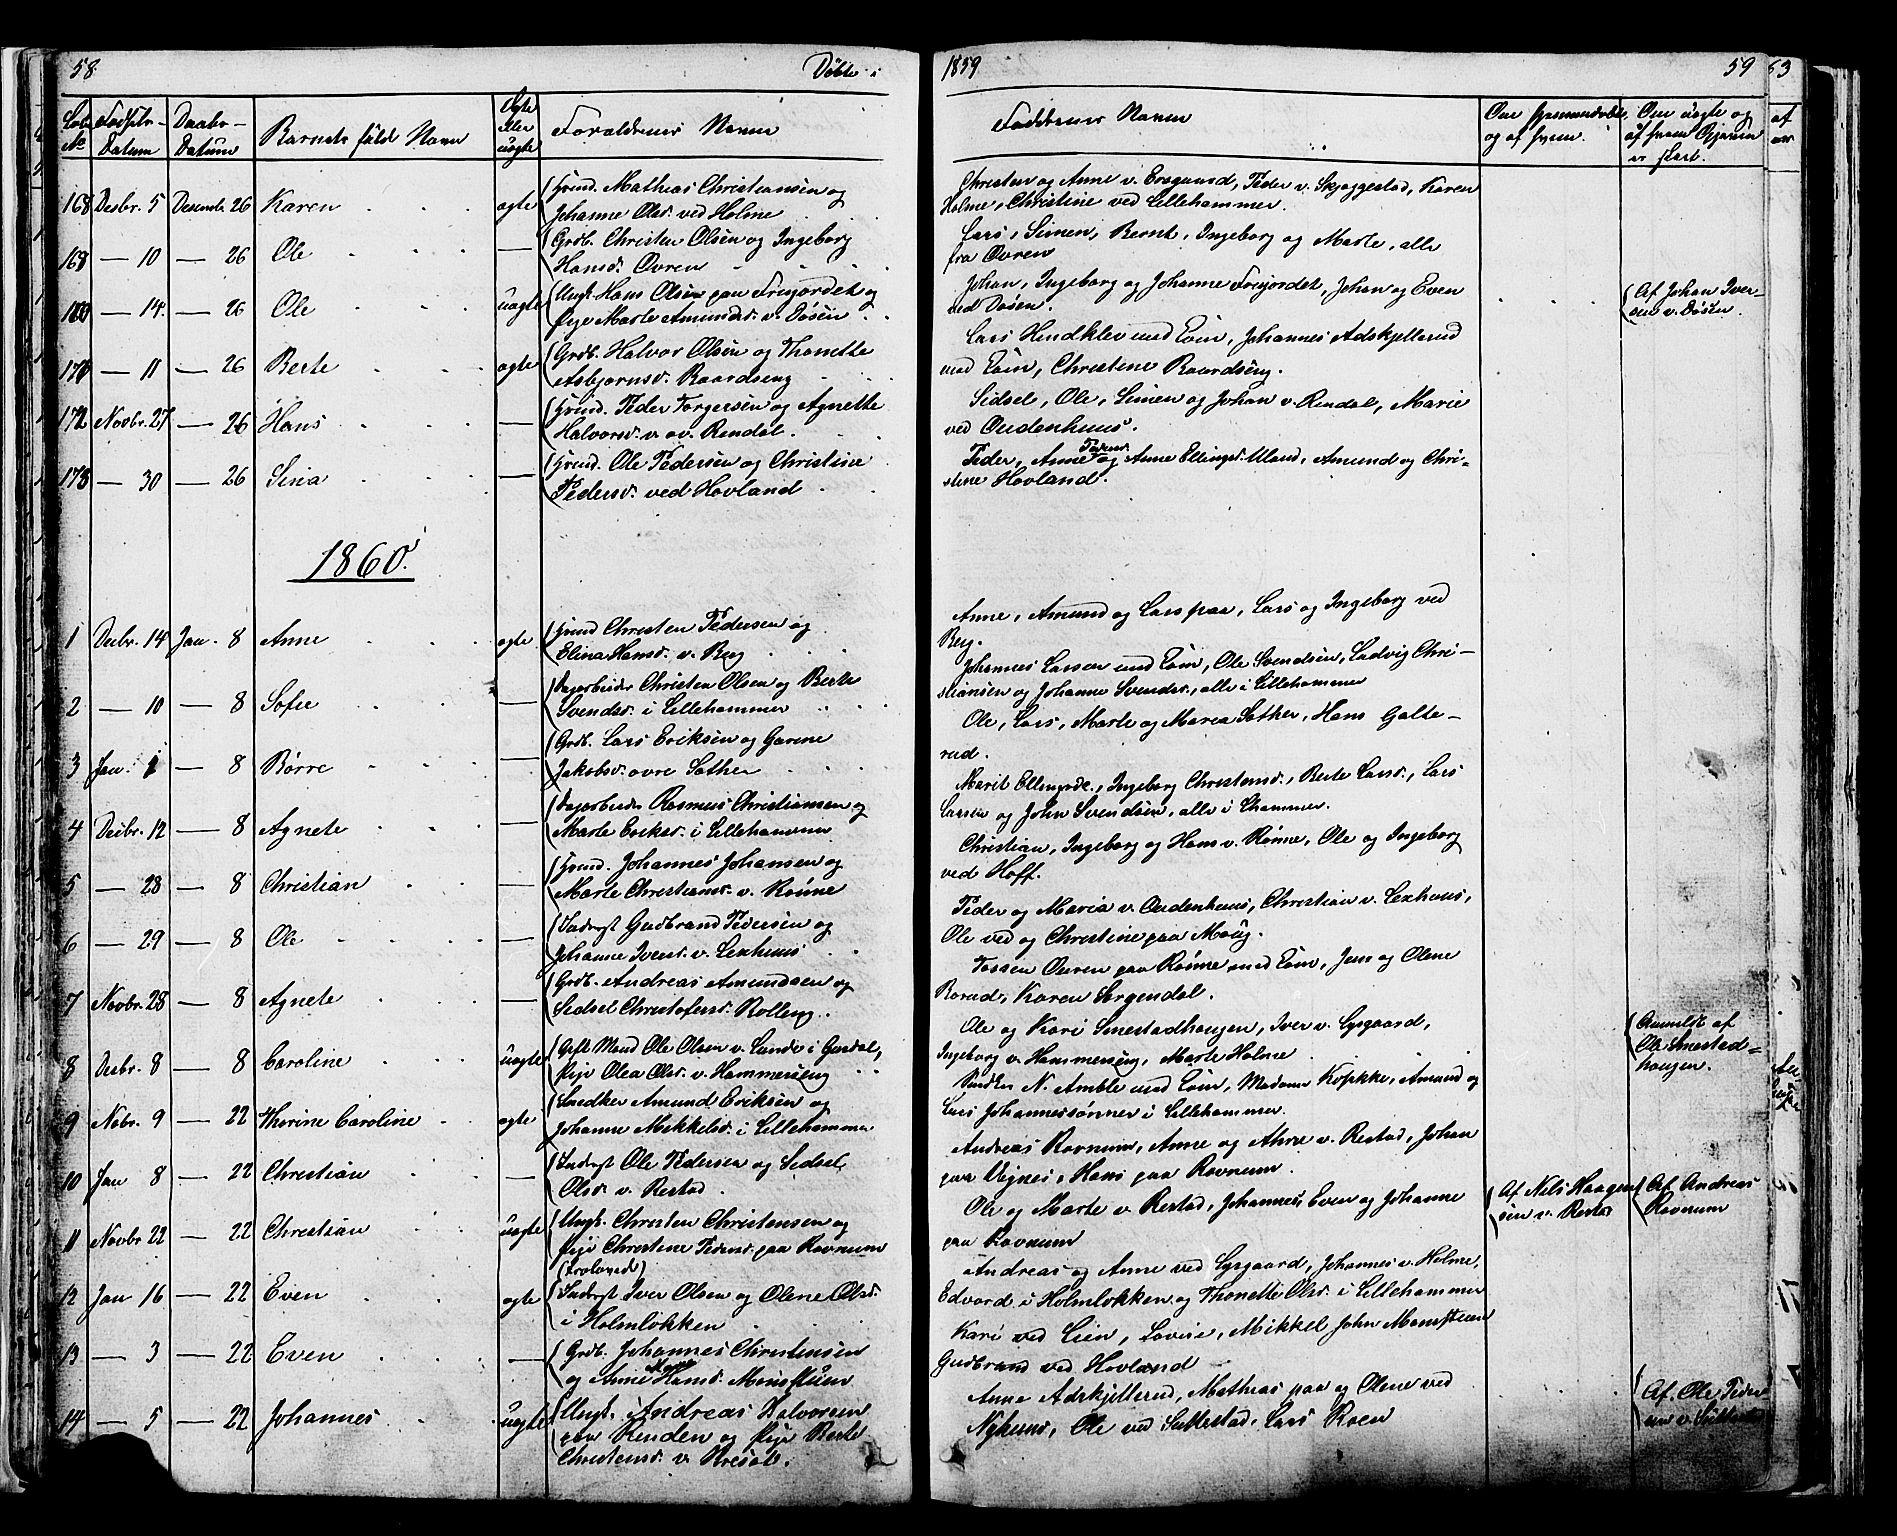 SAH, Fåberg prestekontor, Klokkerbok nr. 7, 1856-1891, s. 58-59